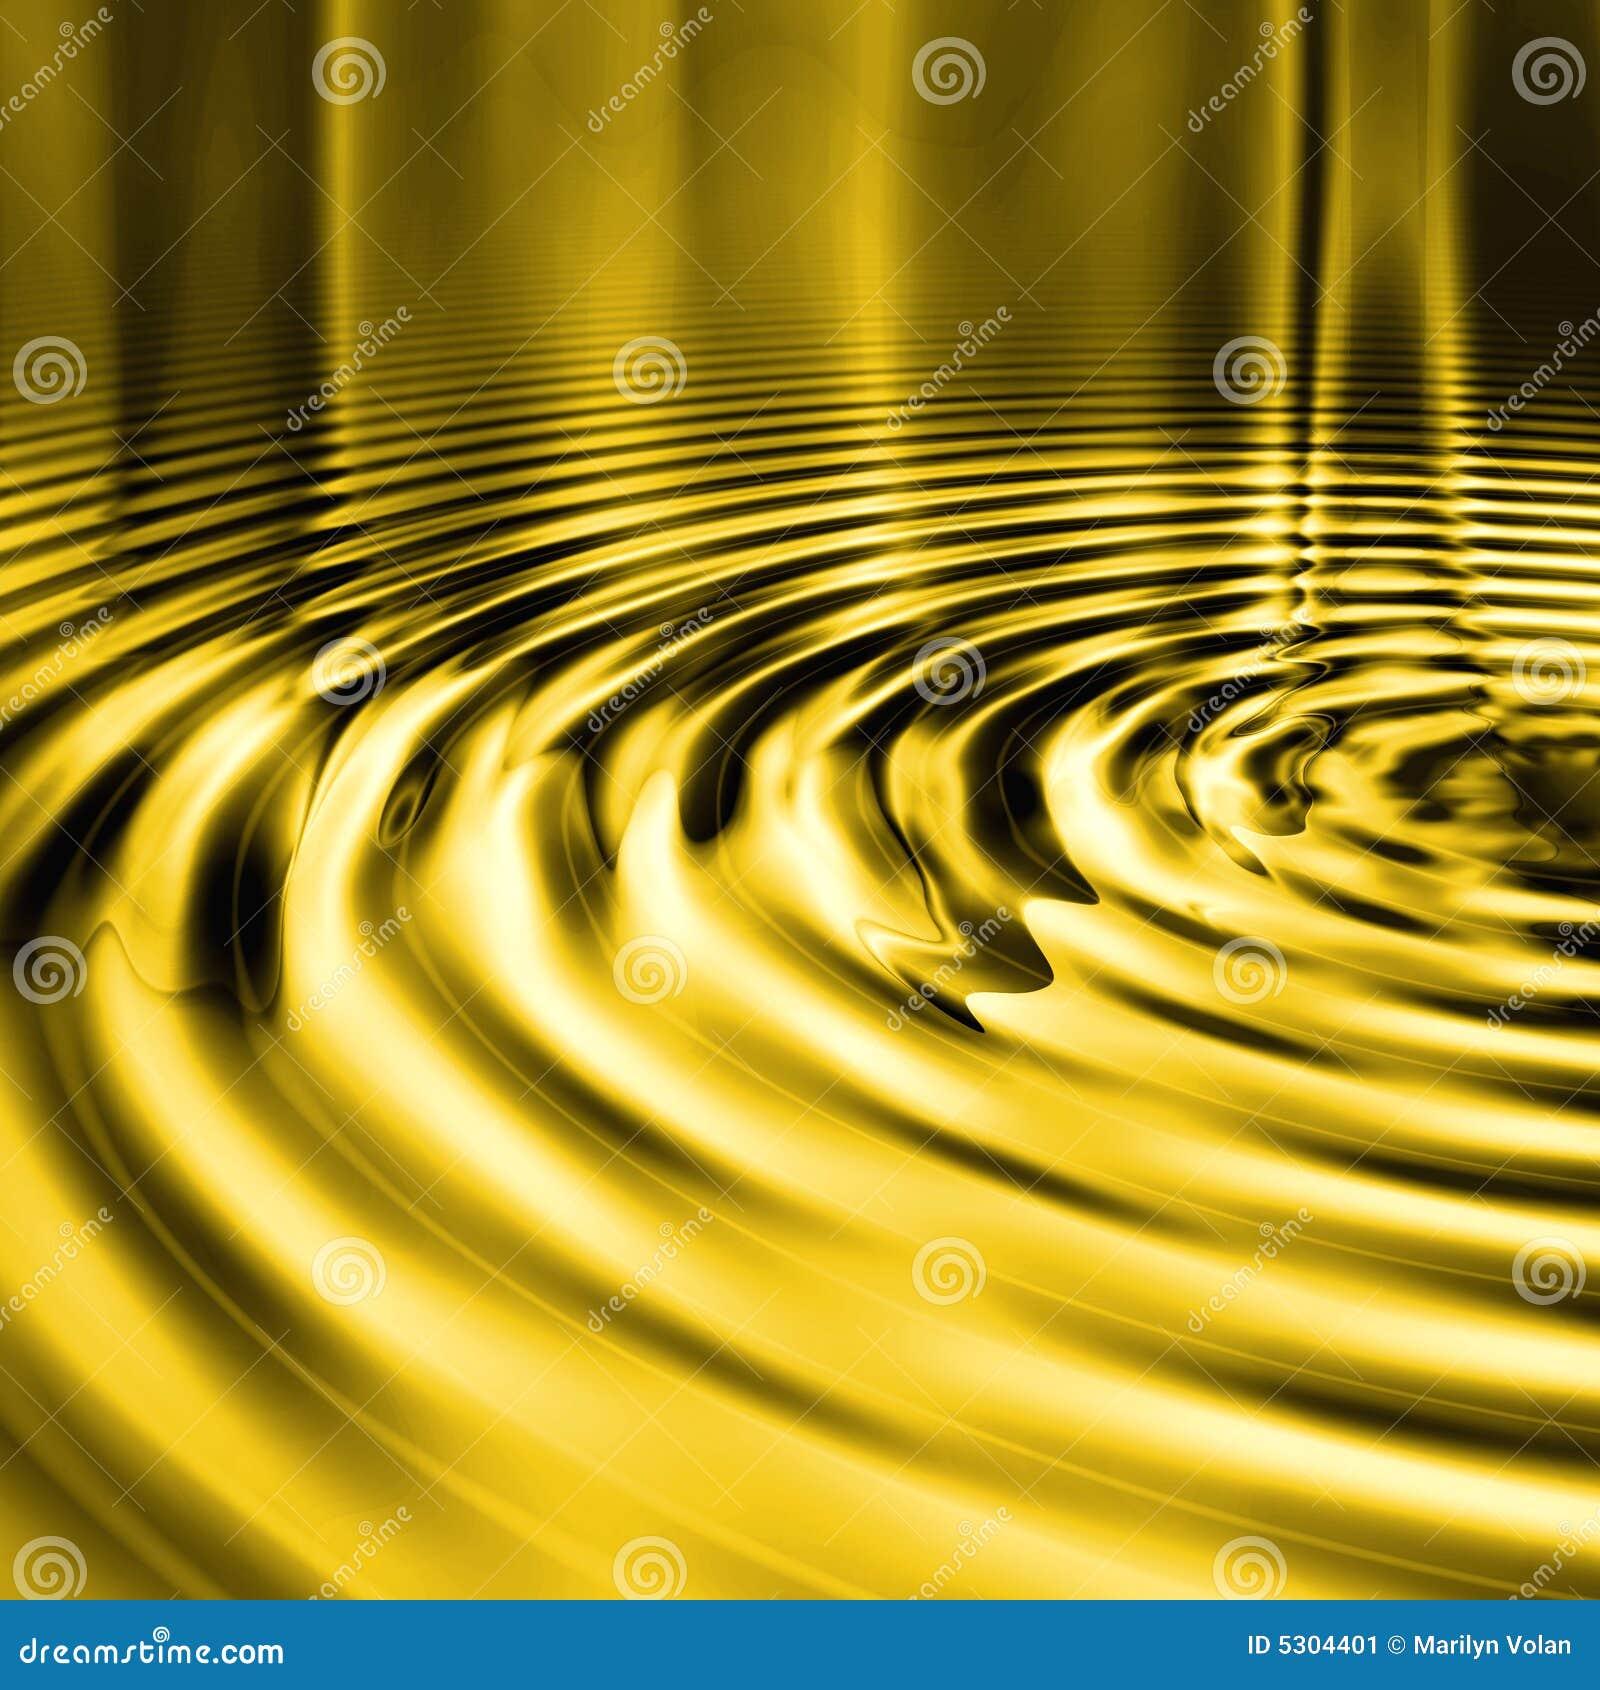 Liquid Gold Ripples